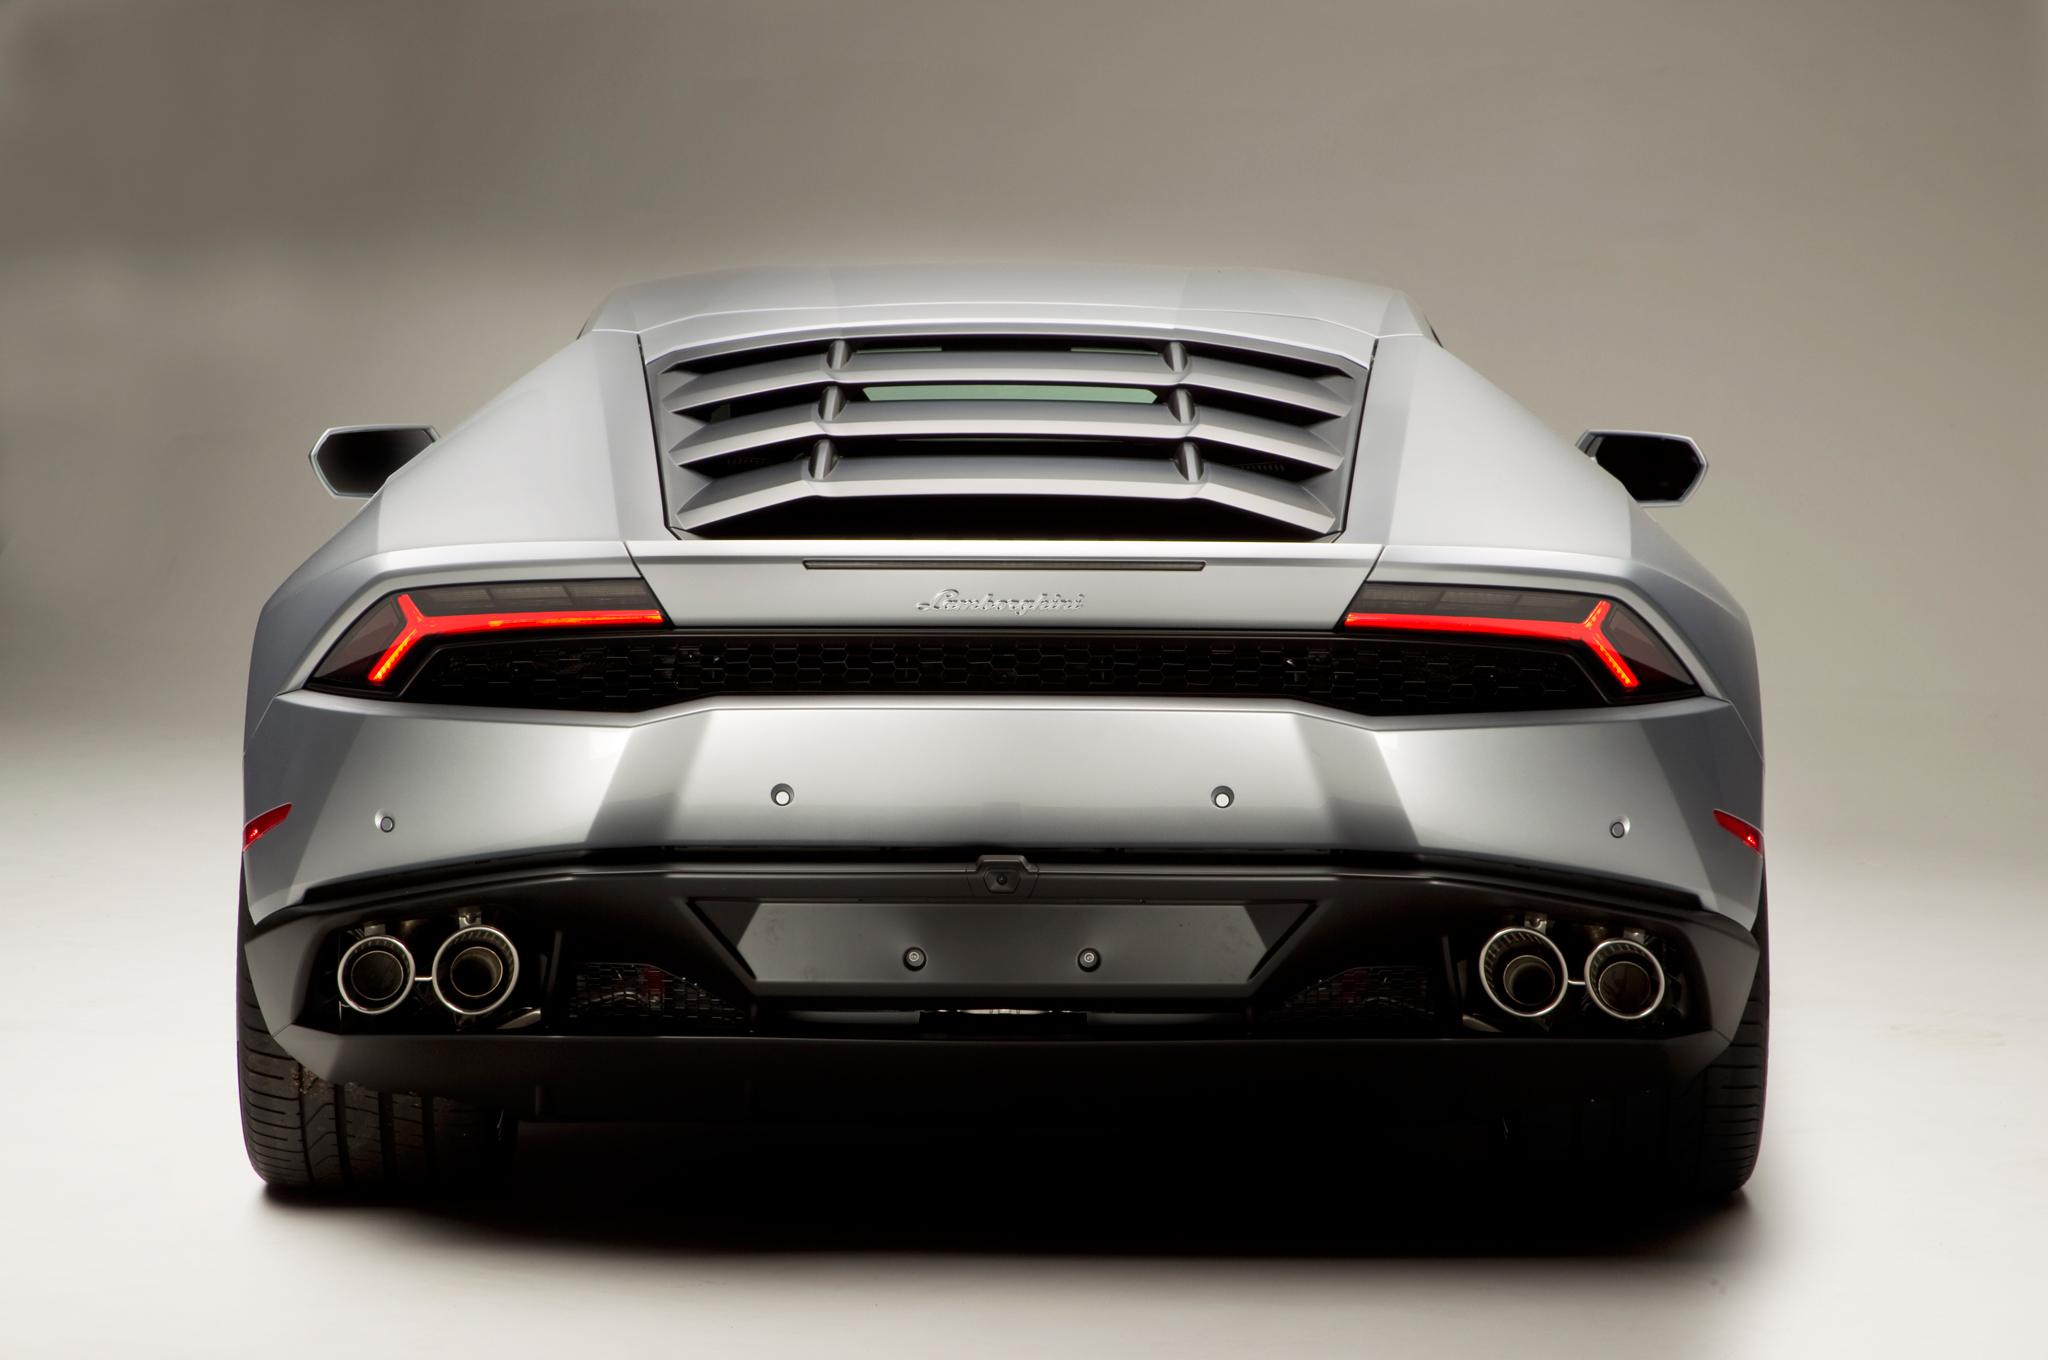 http—image.motortrend.com-f-roadtests-exotic-1312_2015_lamborghini_huracan_first_look-59412068-2015-Lamborghini-Huracan-rear-end